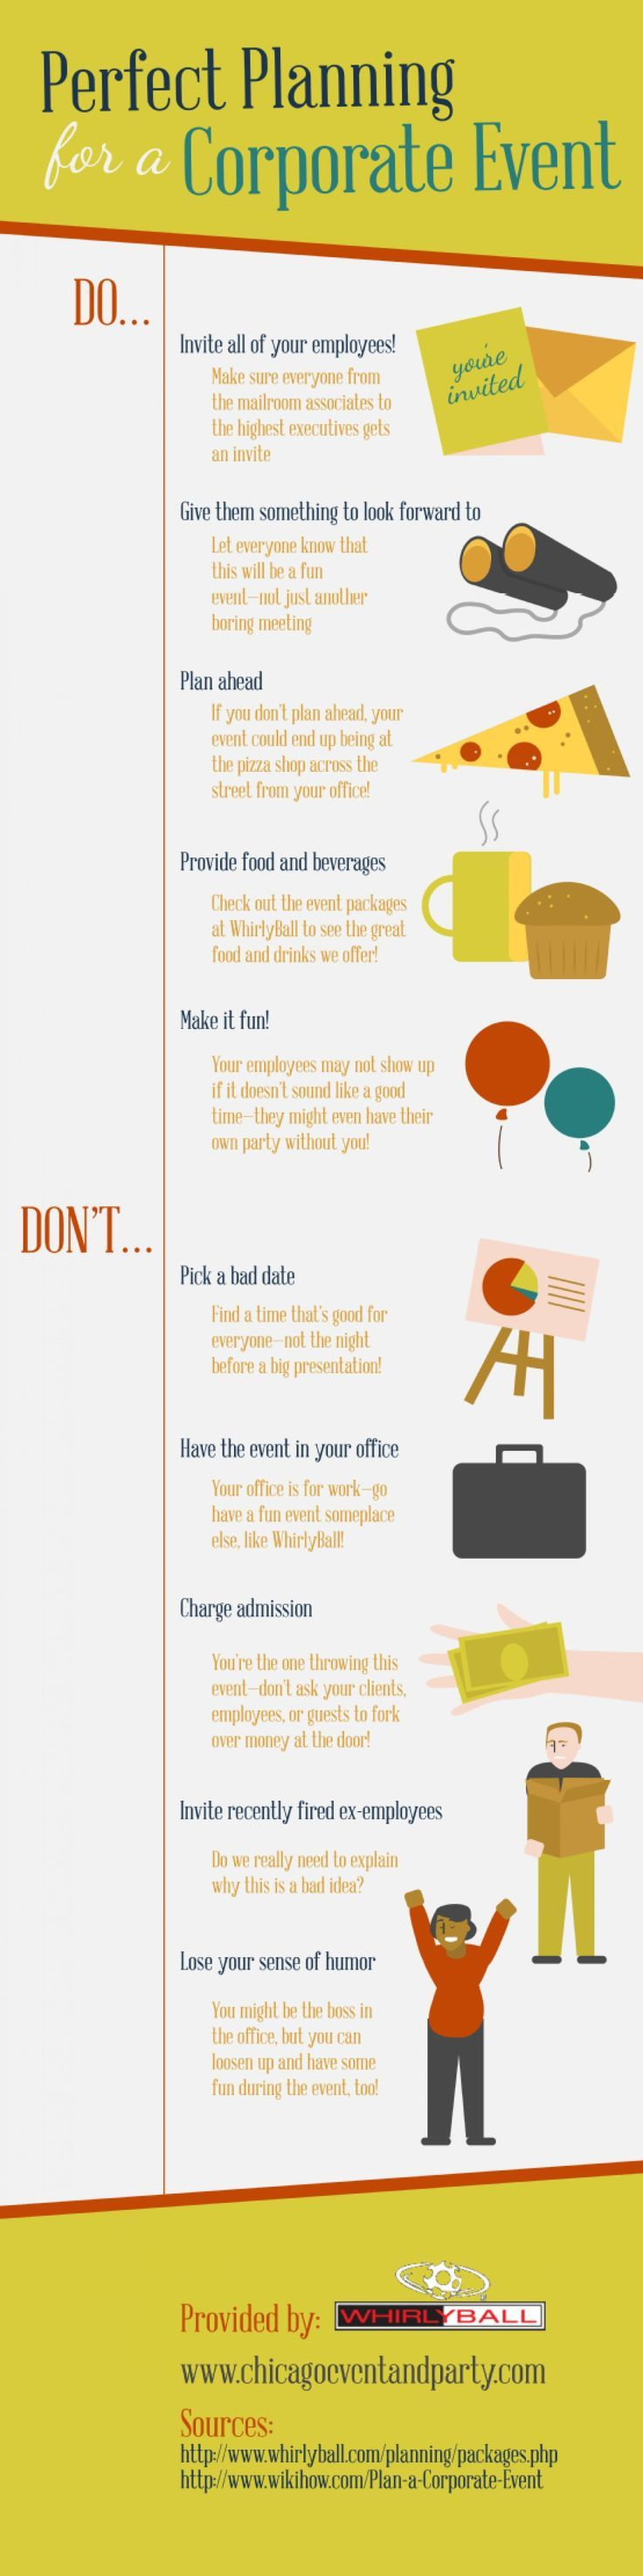 best 25 business anniversary ideas ideas on pinterest